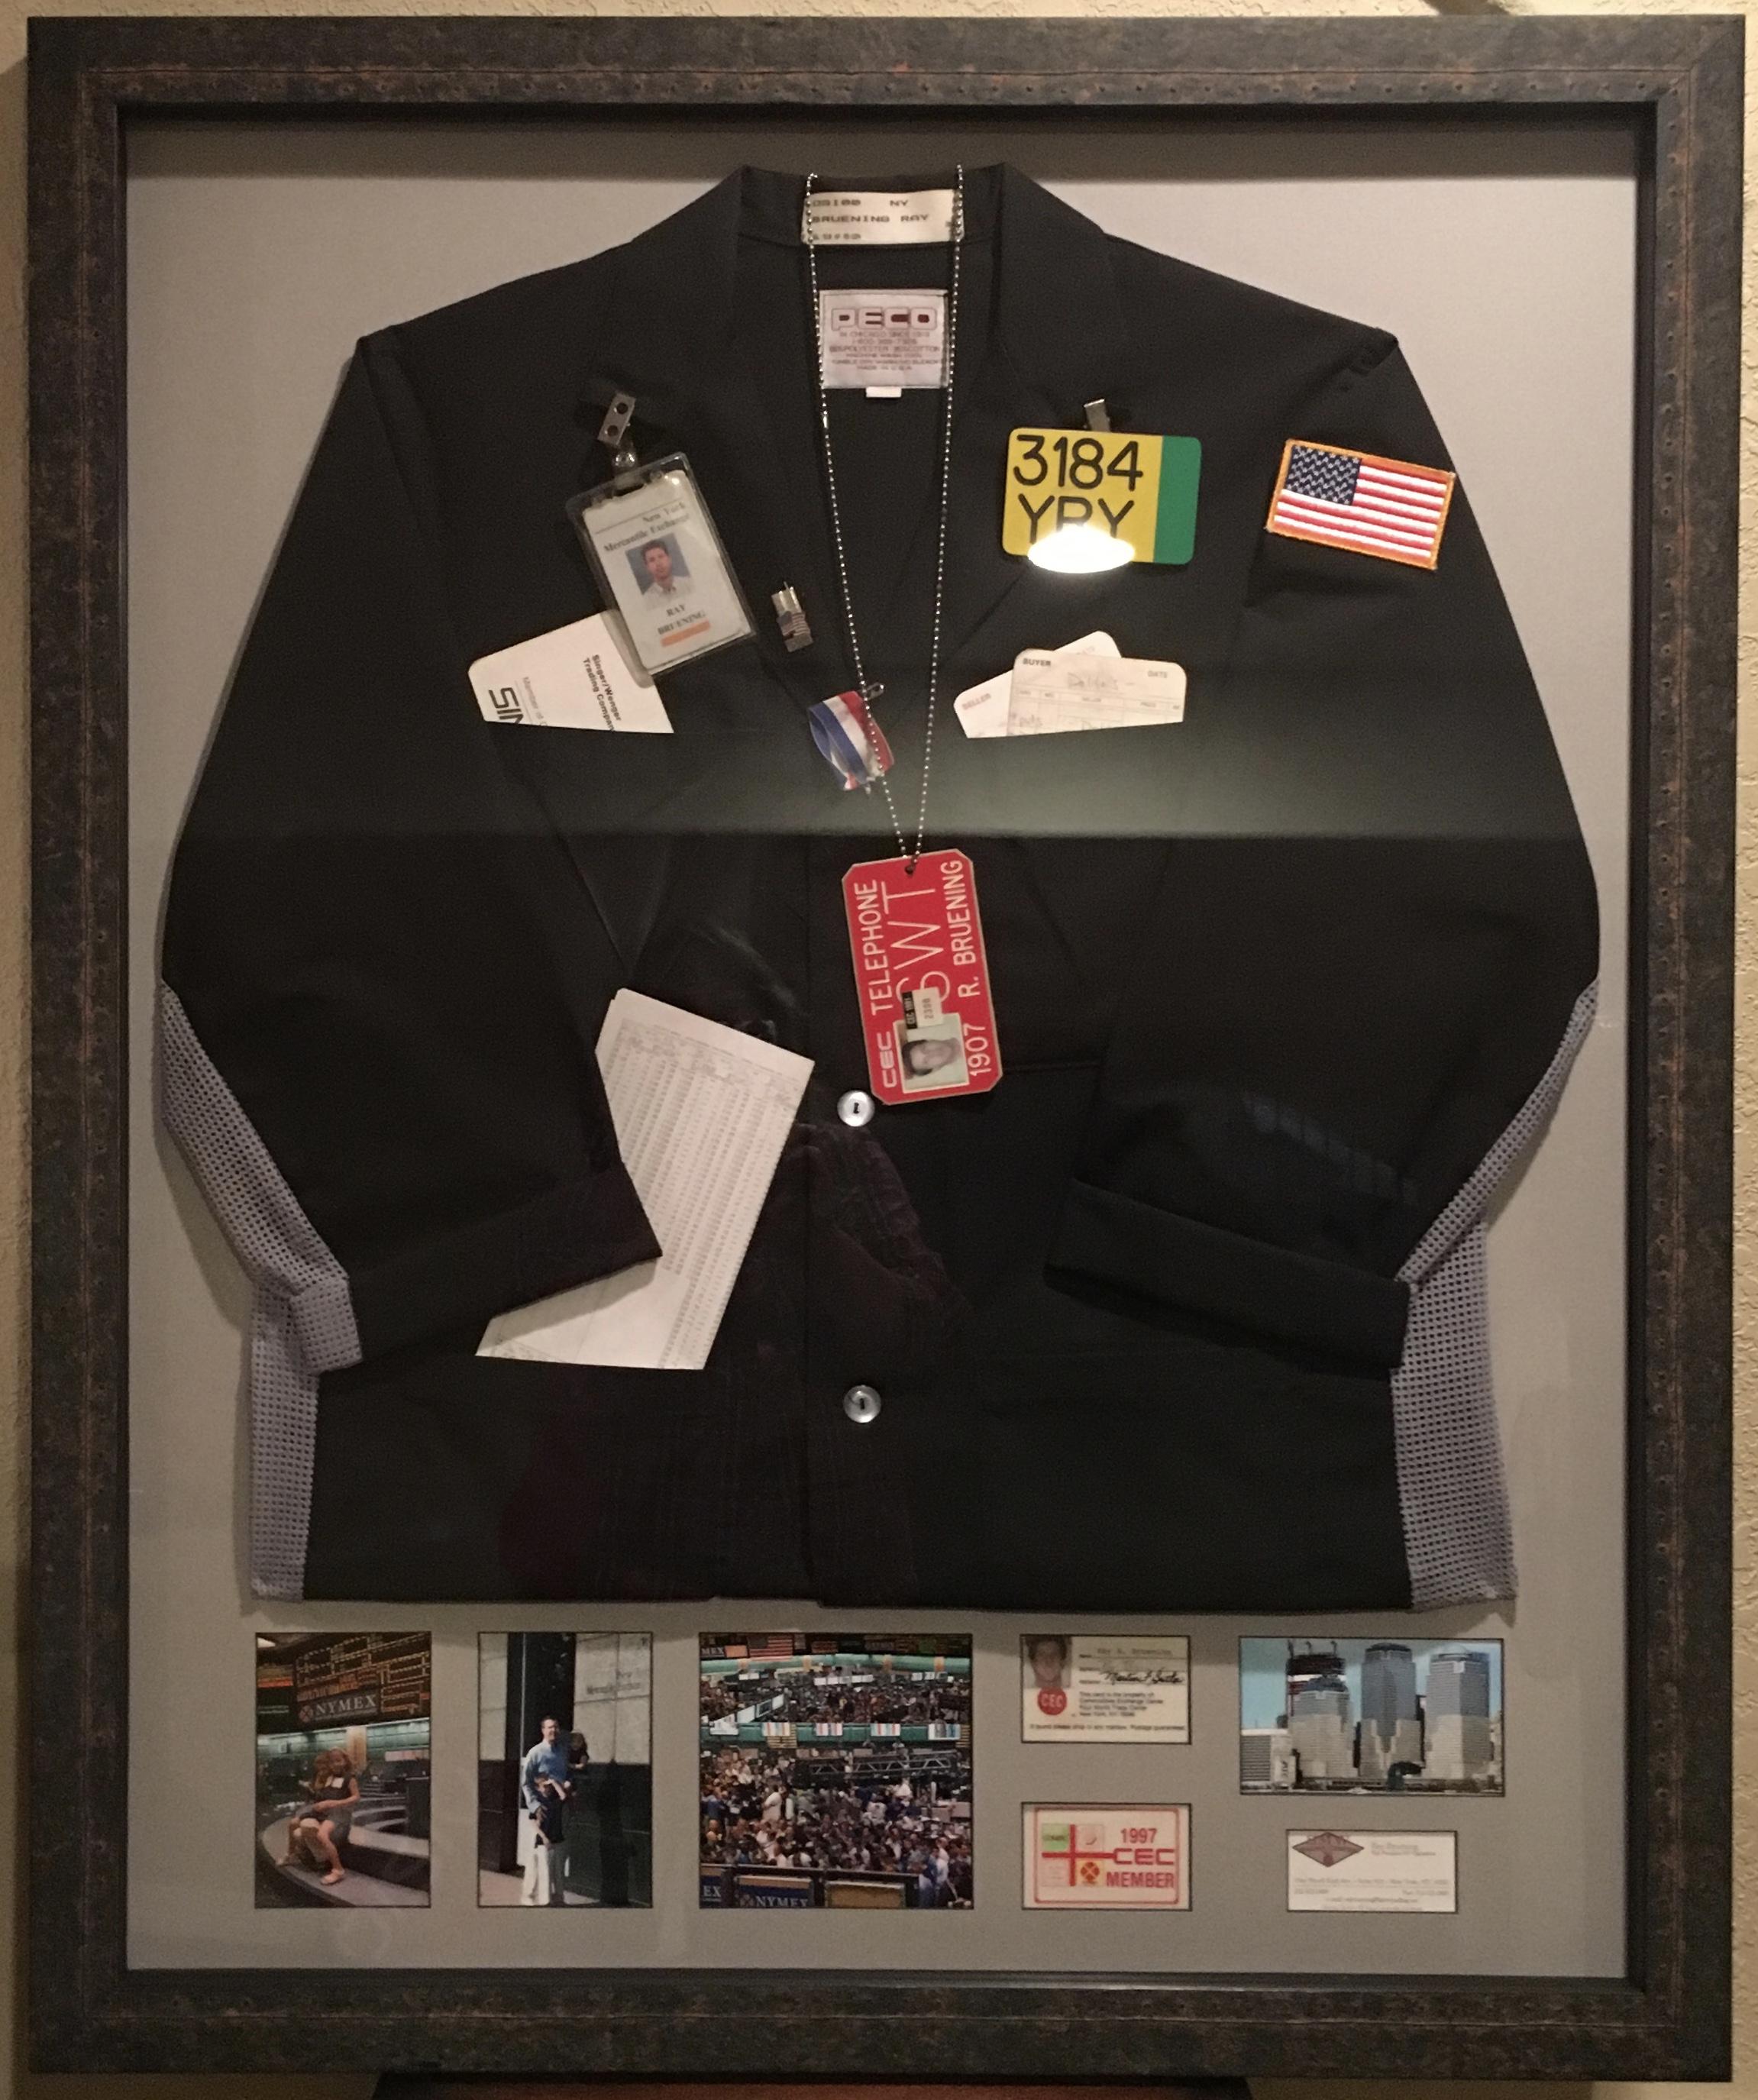 Wall Street trading jacket